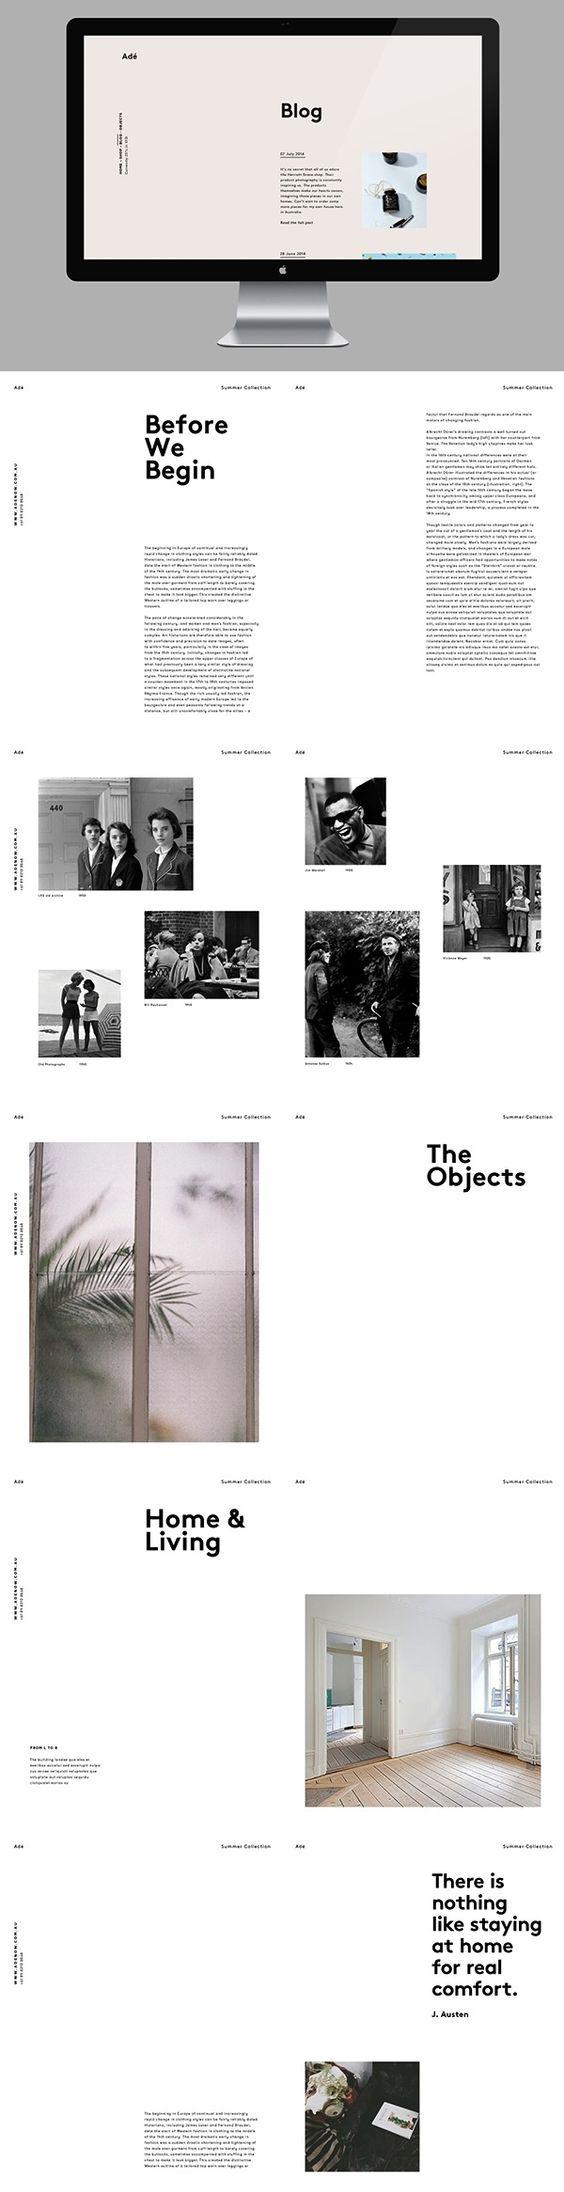 Adé blog web design | Editorial / Poster | Pinterest